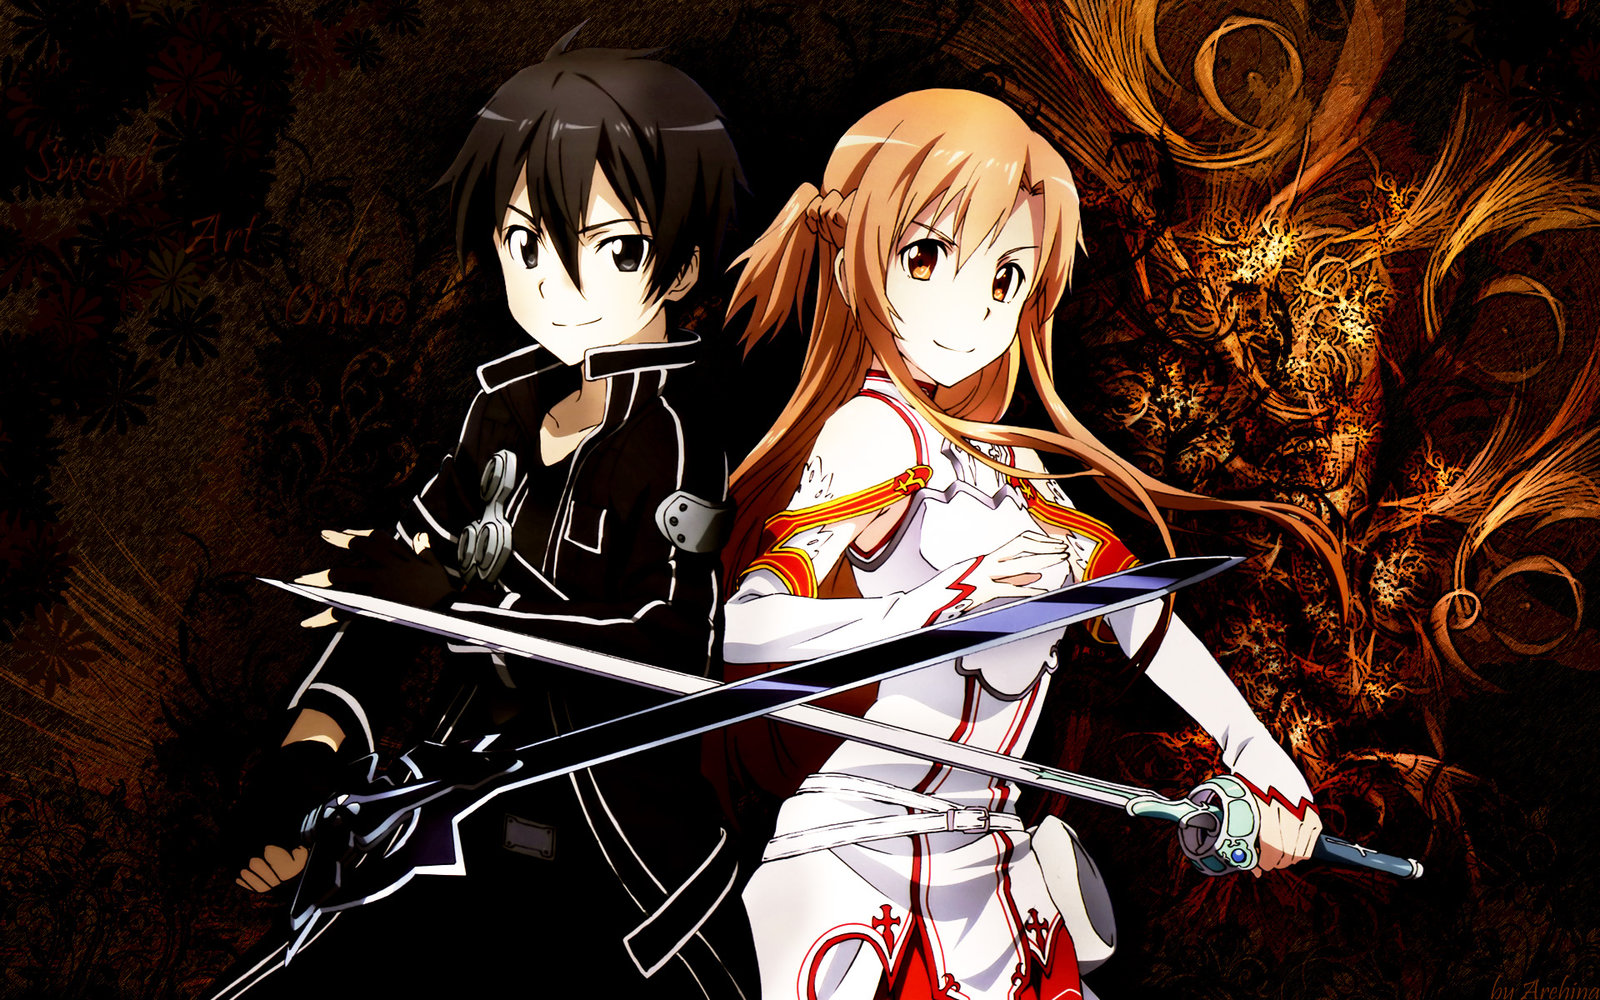 Sword Art Online 955174 Sword Art Online 955184 Sword Art Online 1600x1000